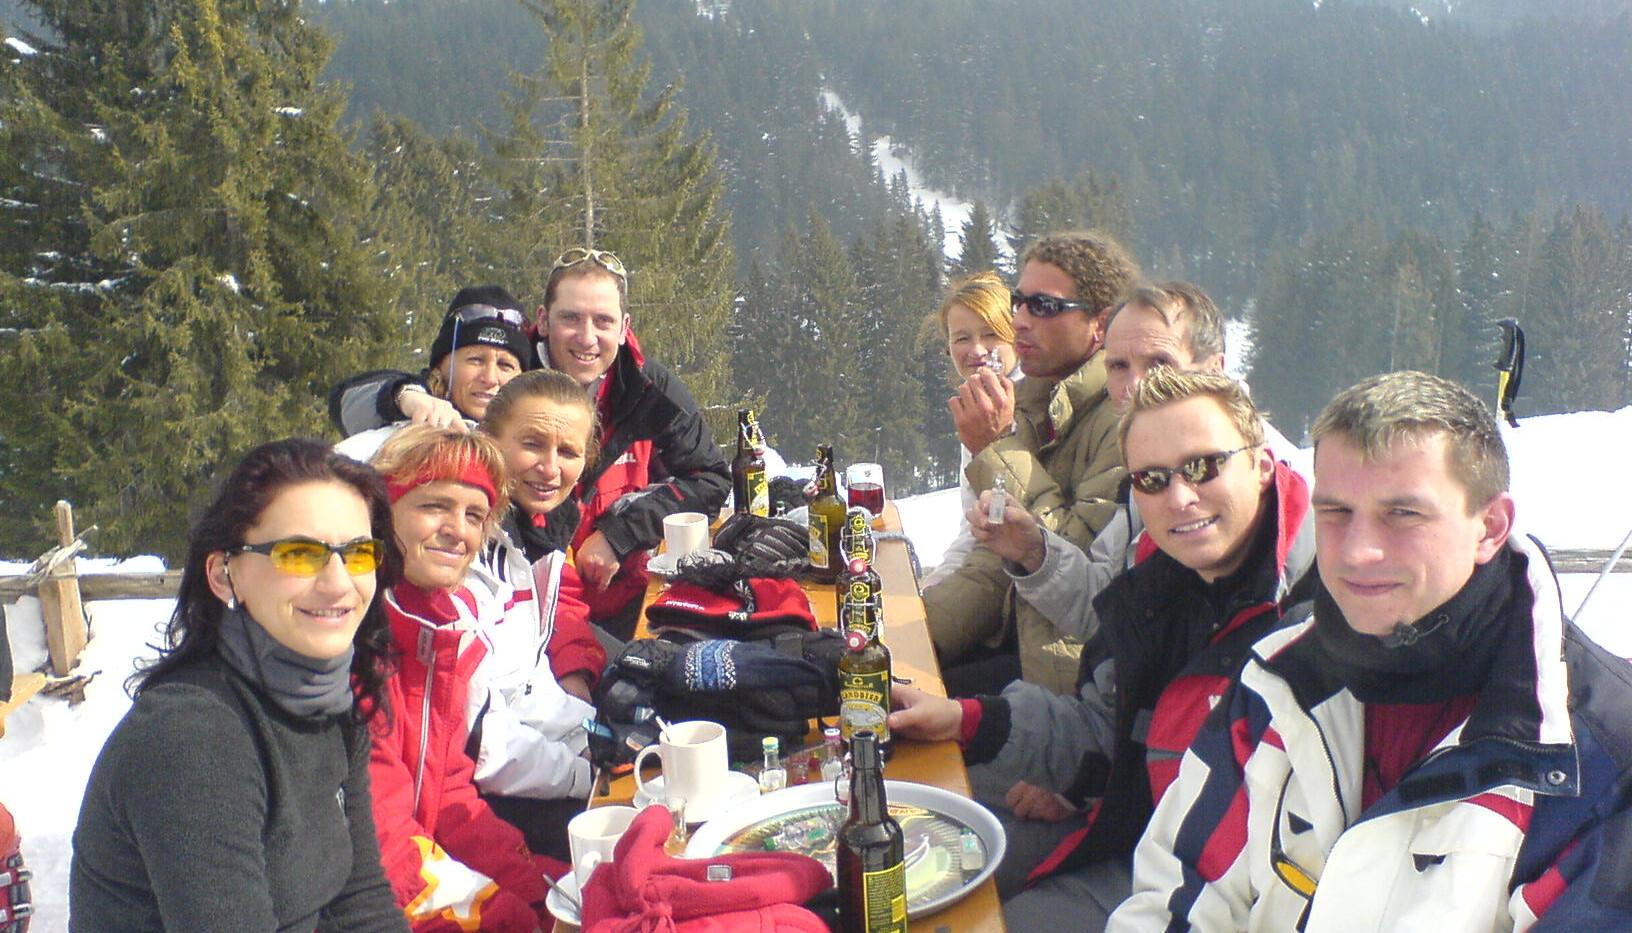 skireise brix 06 005.jpeg